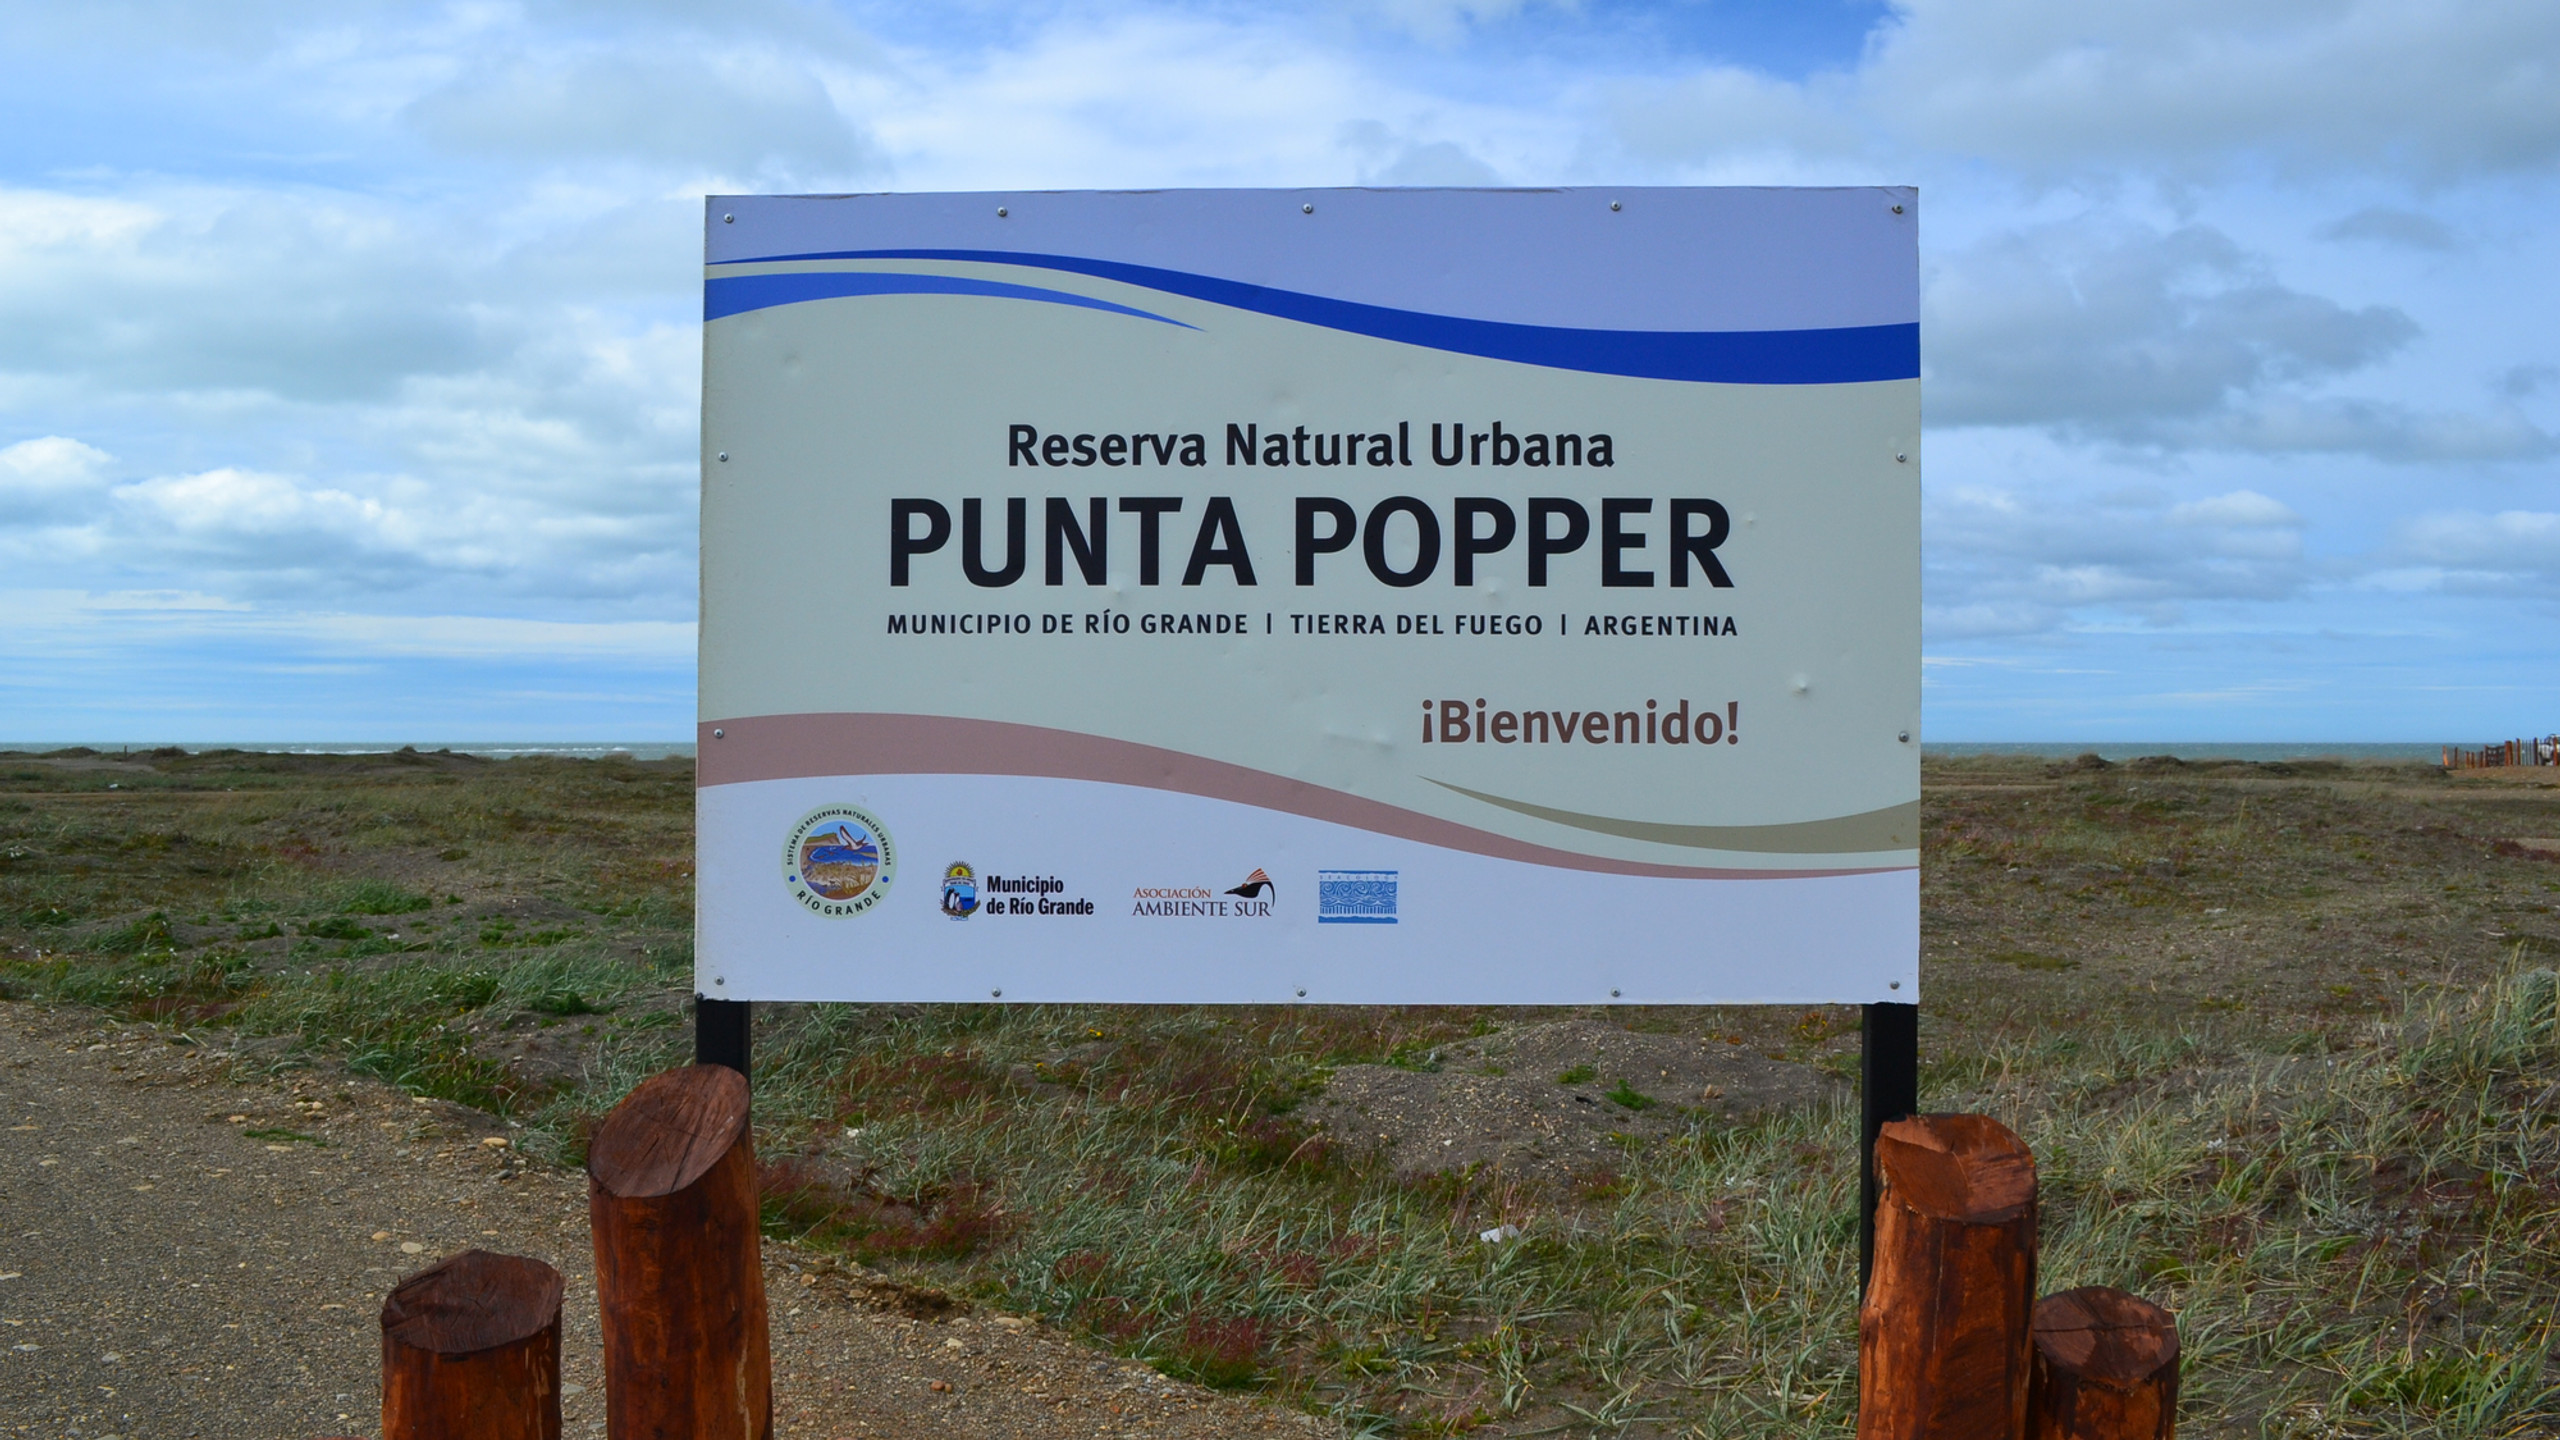 Punta Popper